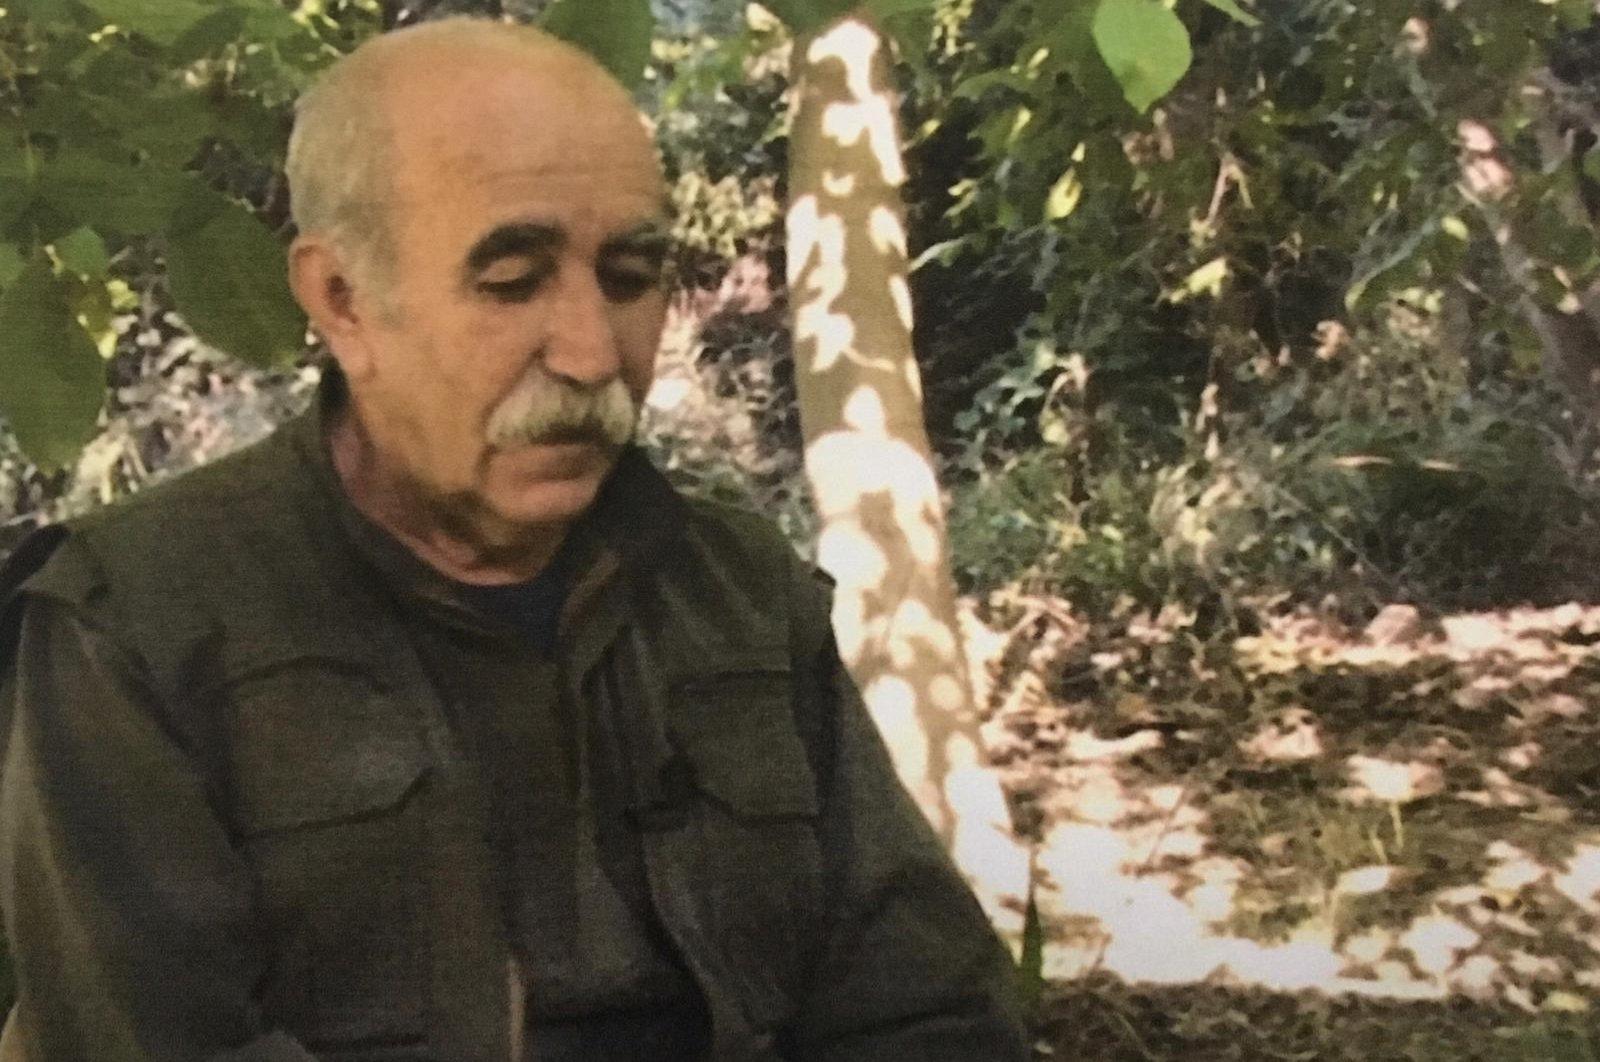 A photo of prominent PKK terrorist Ali Haydar Kaytan, possibly in northern Iraq's Qandil Mountains. (DHA Photo)